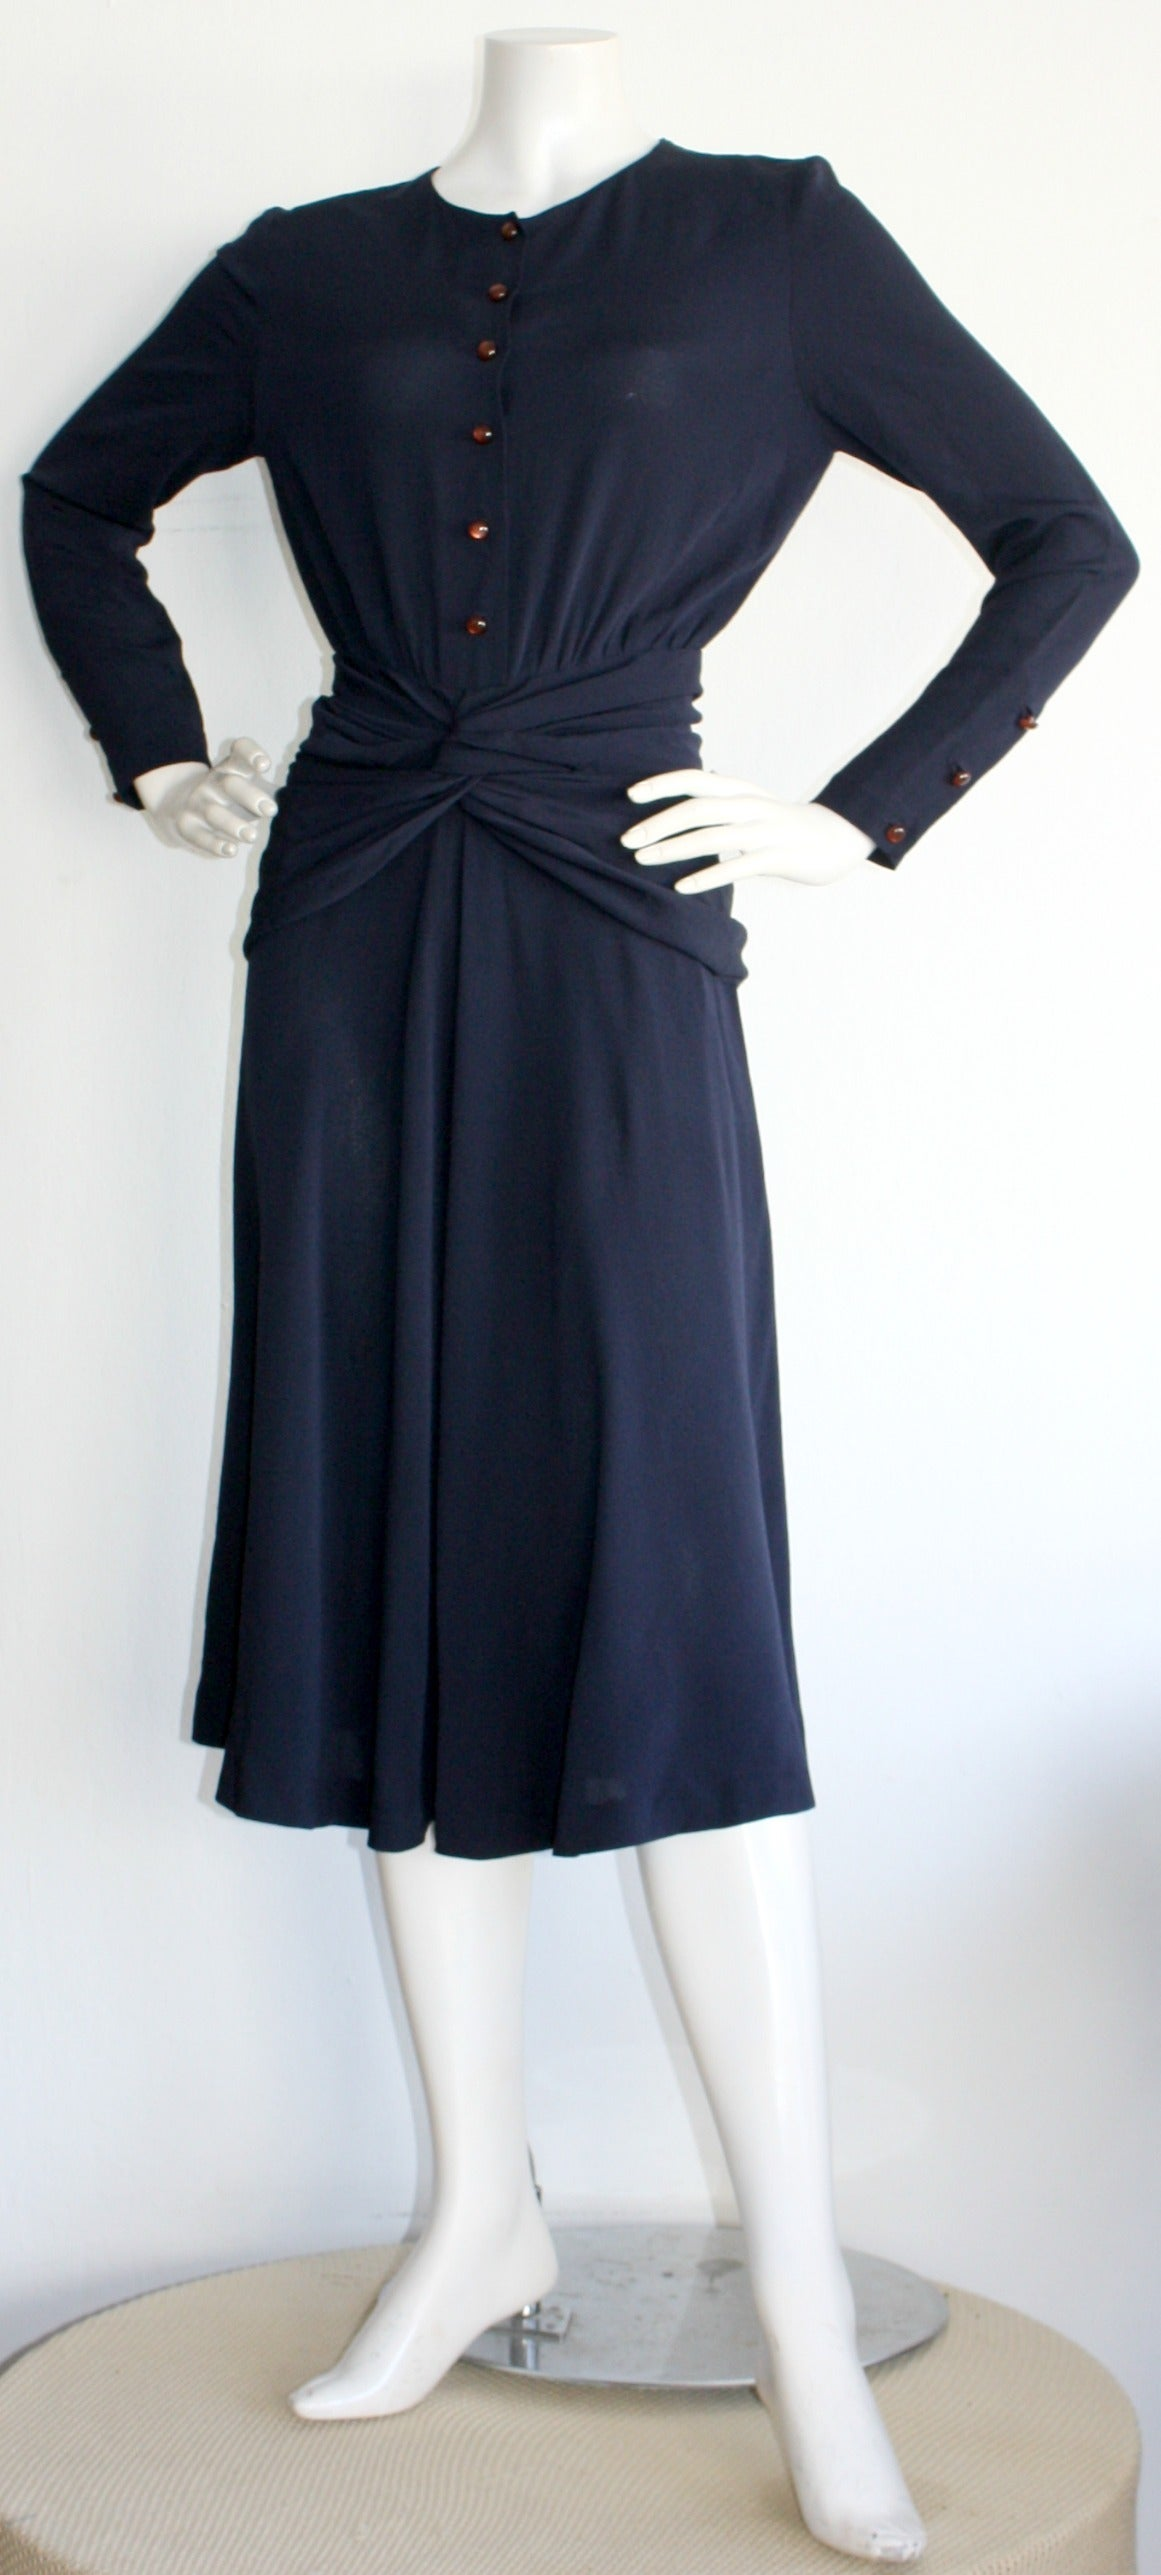 Womens Vintage-Style Fashion, Clothing Decor ModCloth